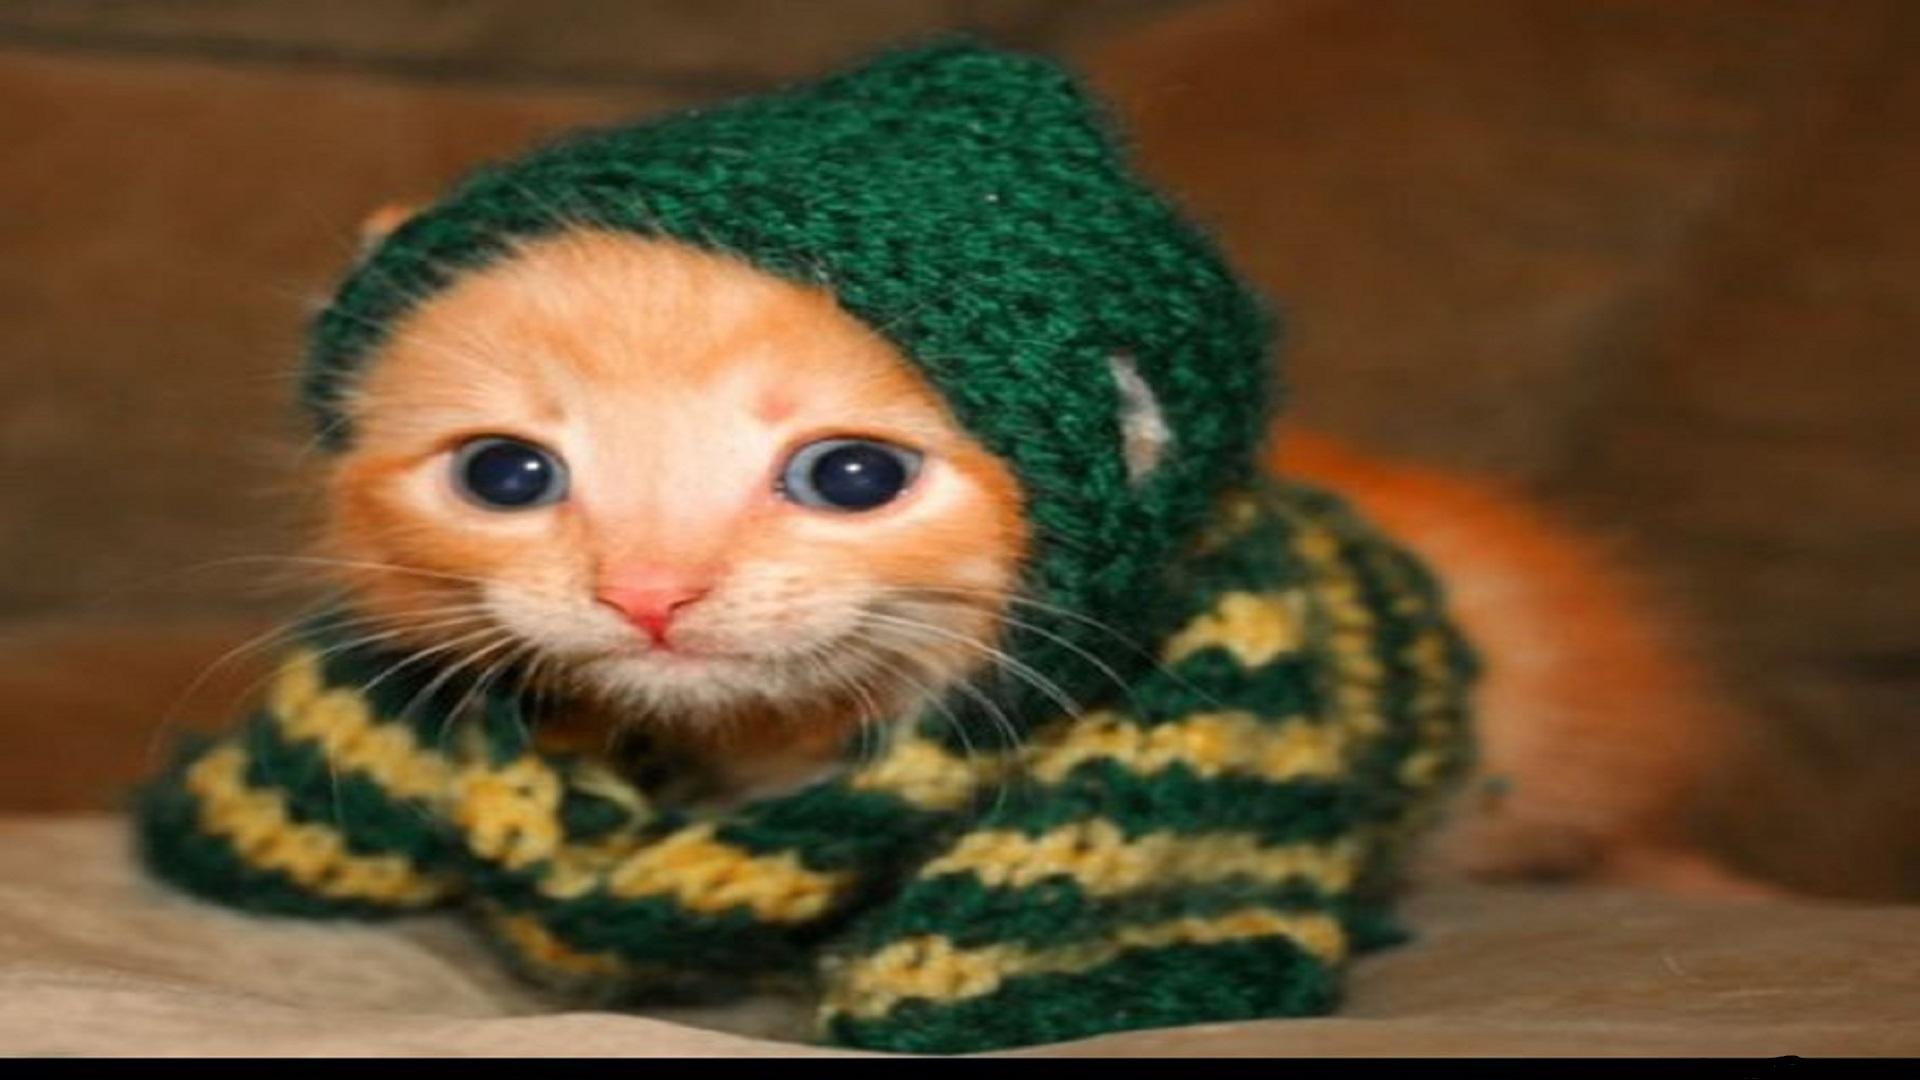 Beautiful Cats Wearing Cute Dress Free Hd Wallpapers Hd Wallpaper